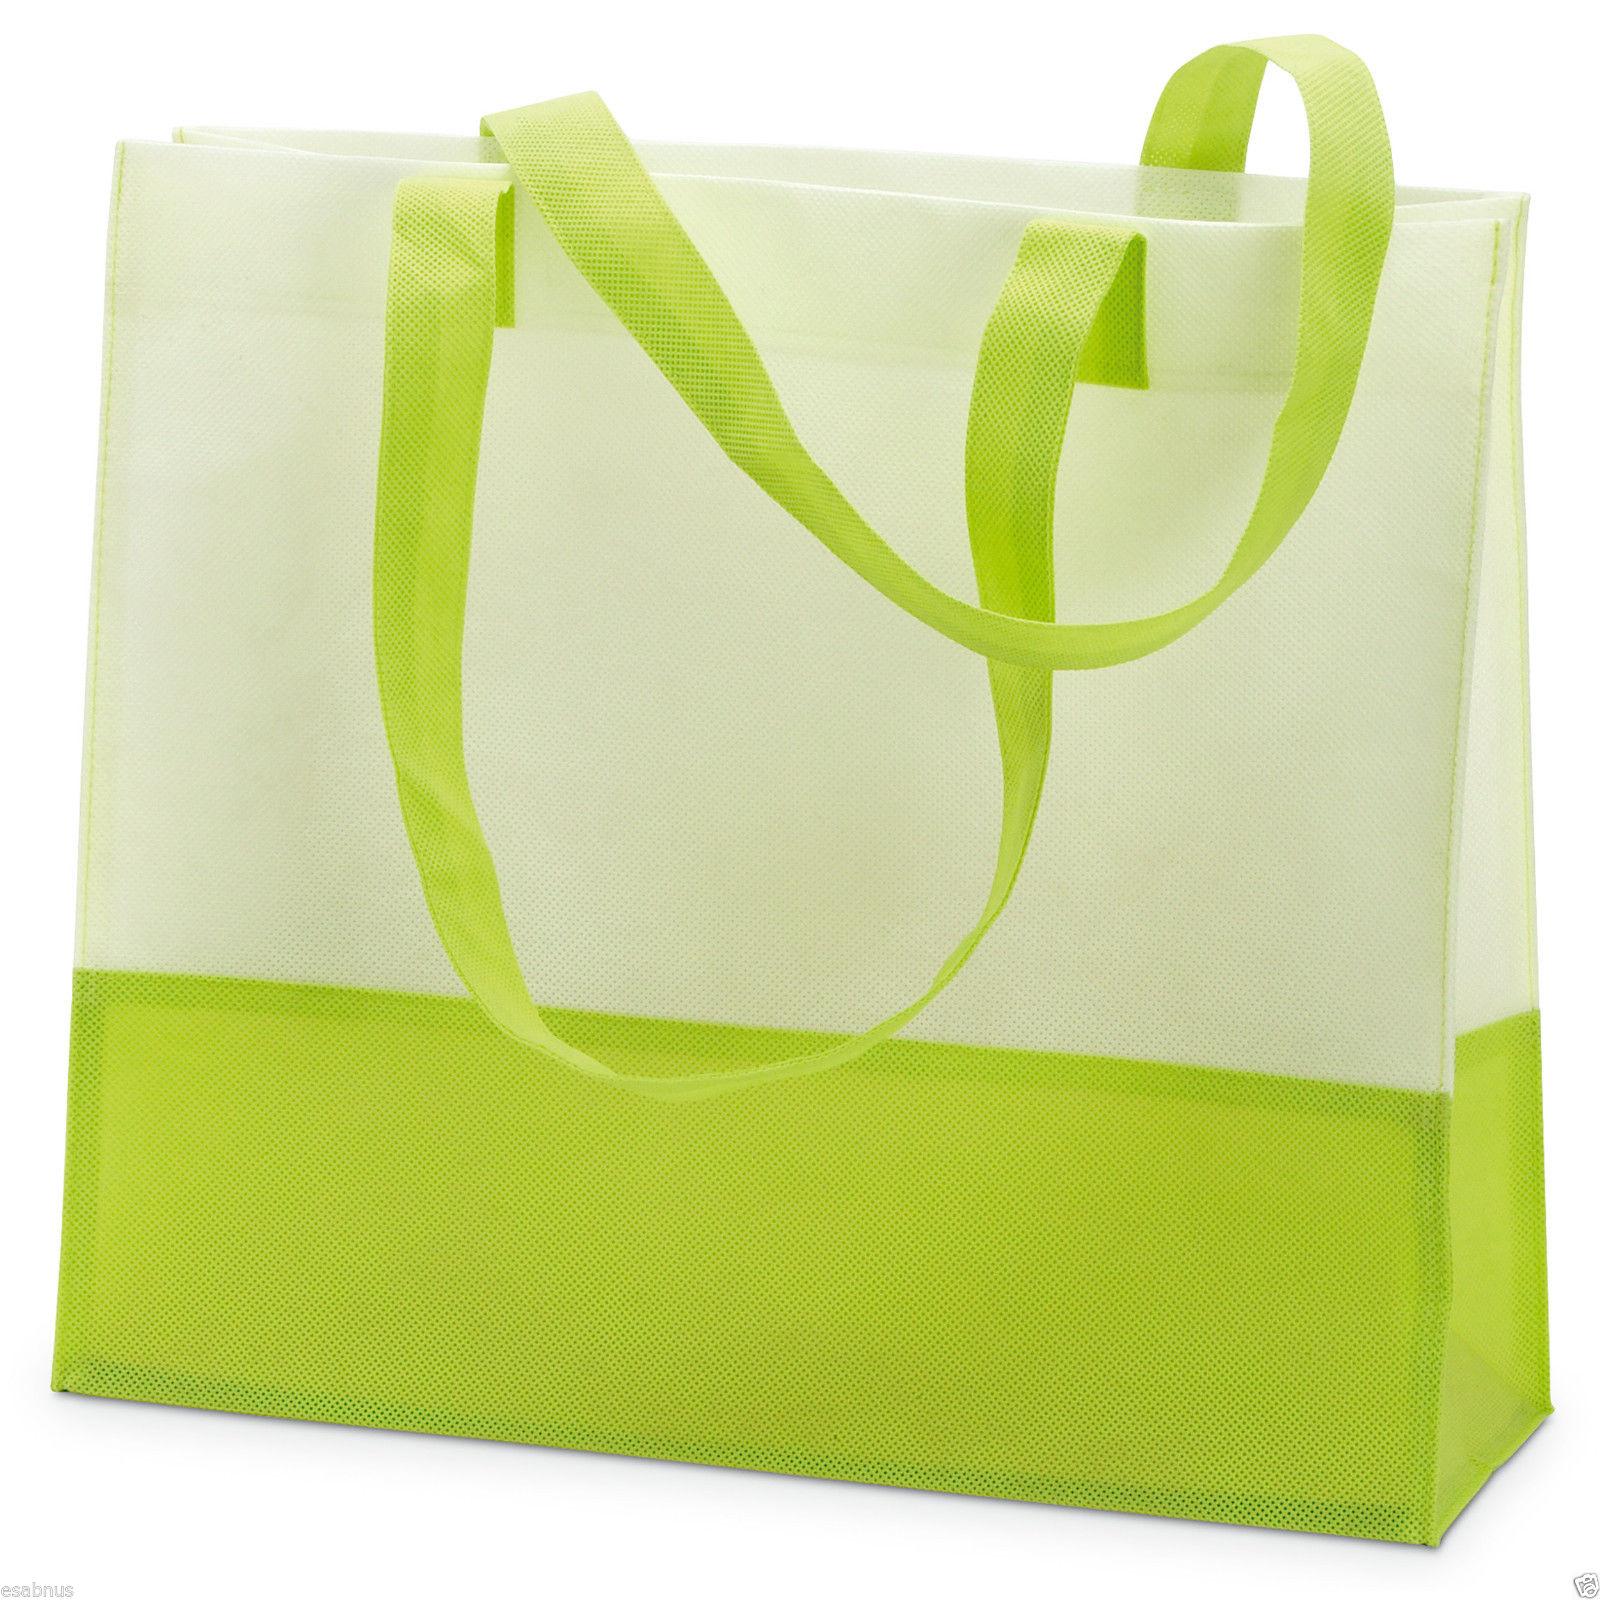 Non Woven Beach bag /Shopping bag 40 x 35.5 x 13 cm- lightweight